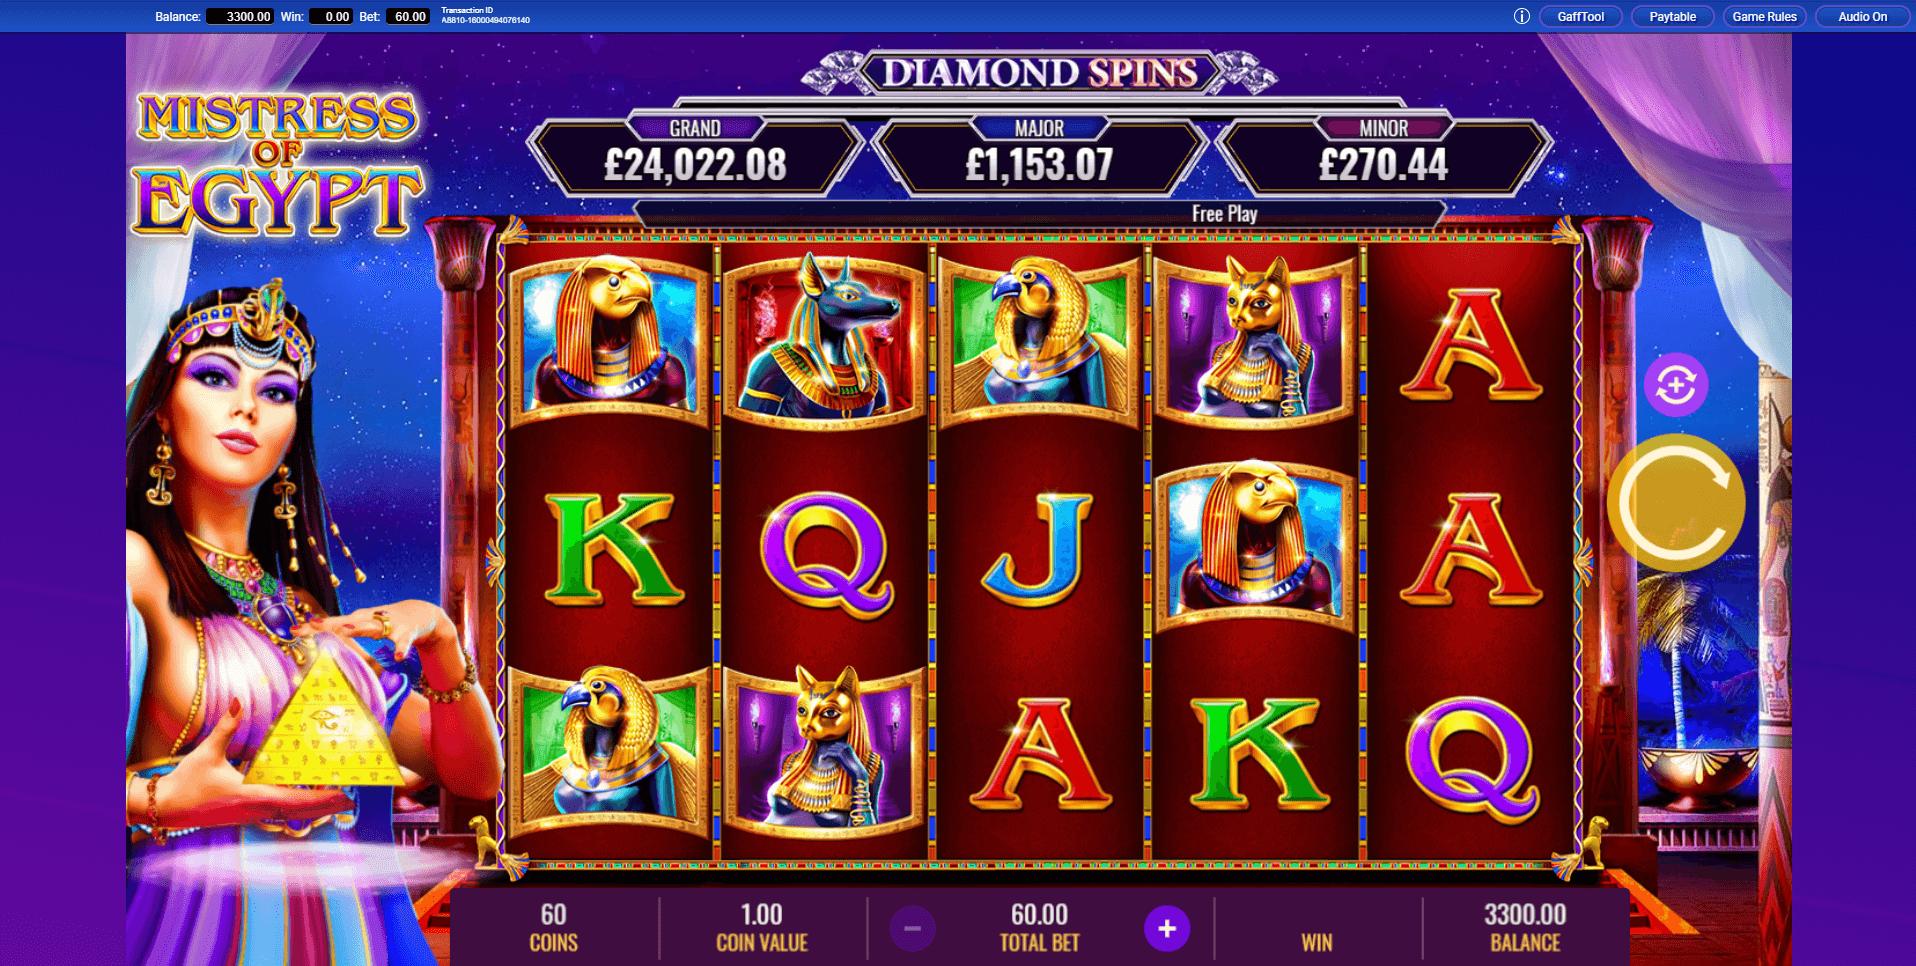 Mistress of Egypt Diamond Spins slot machine screenshot